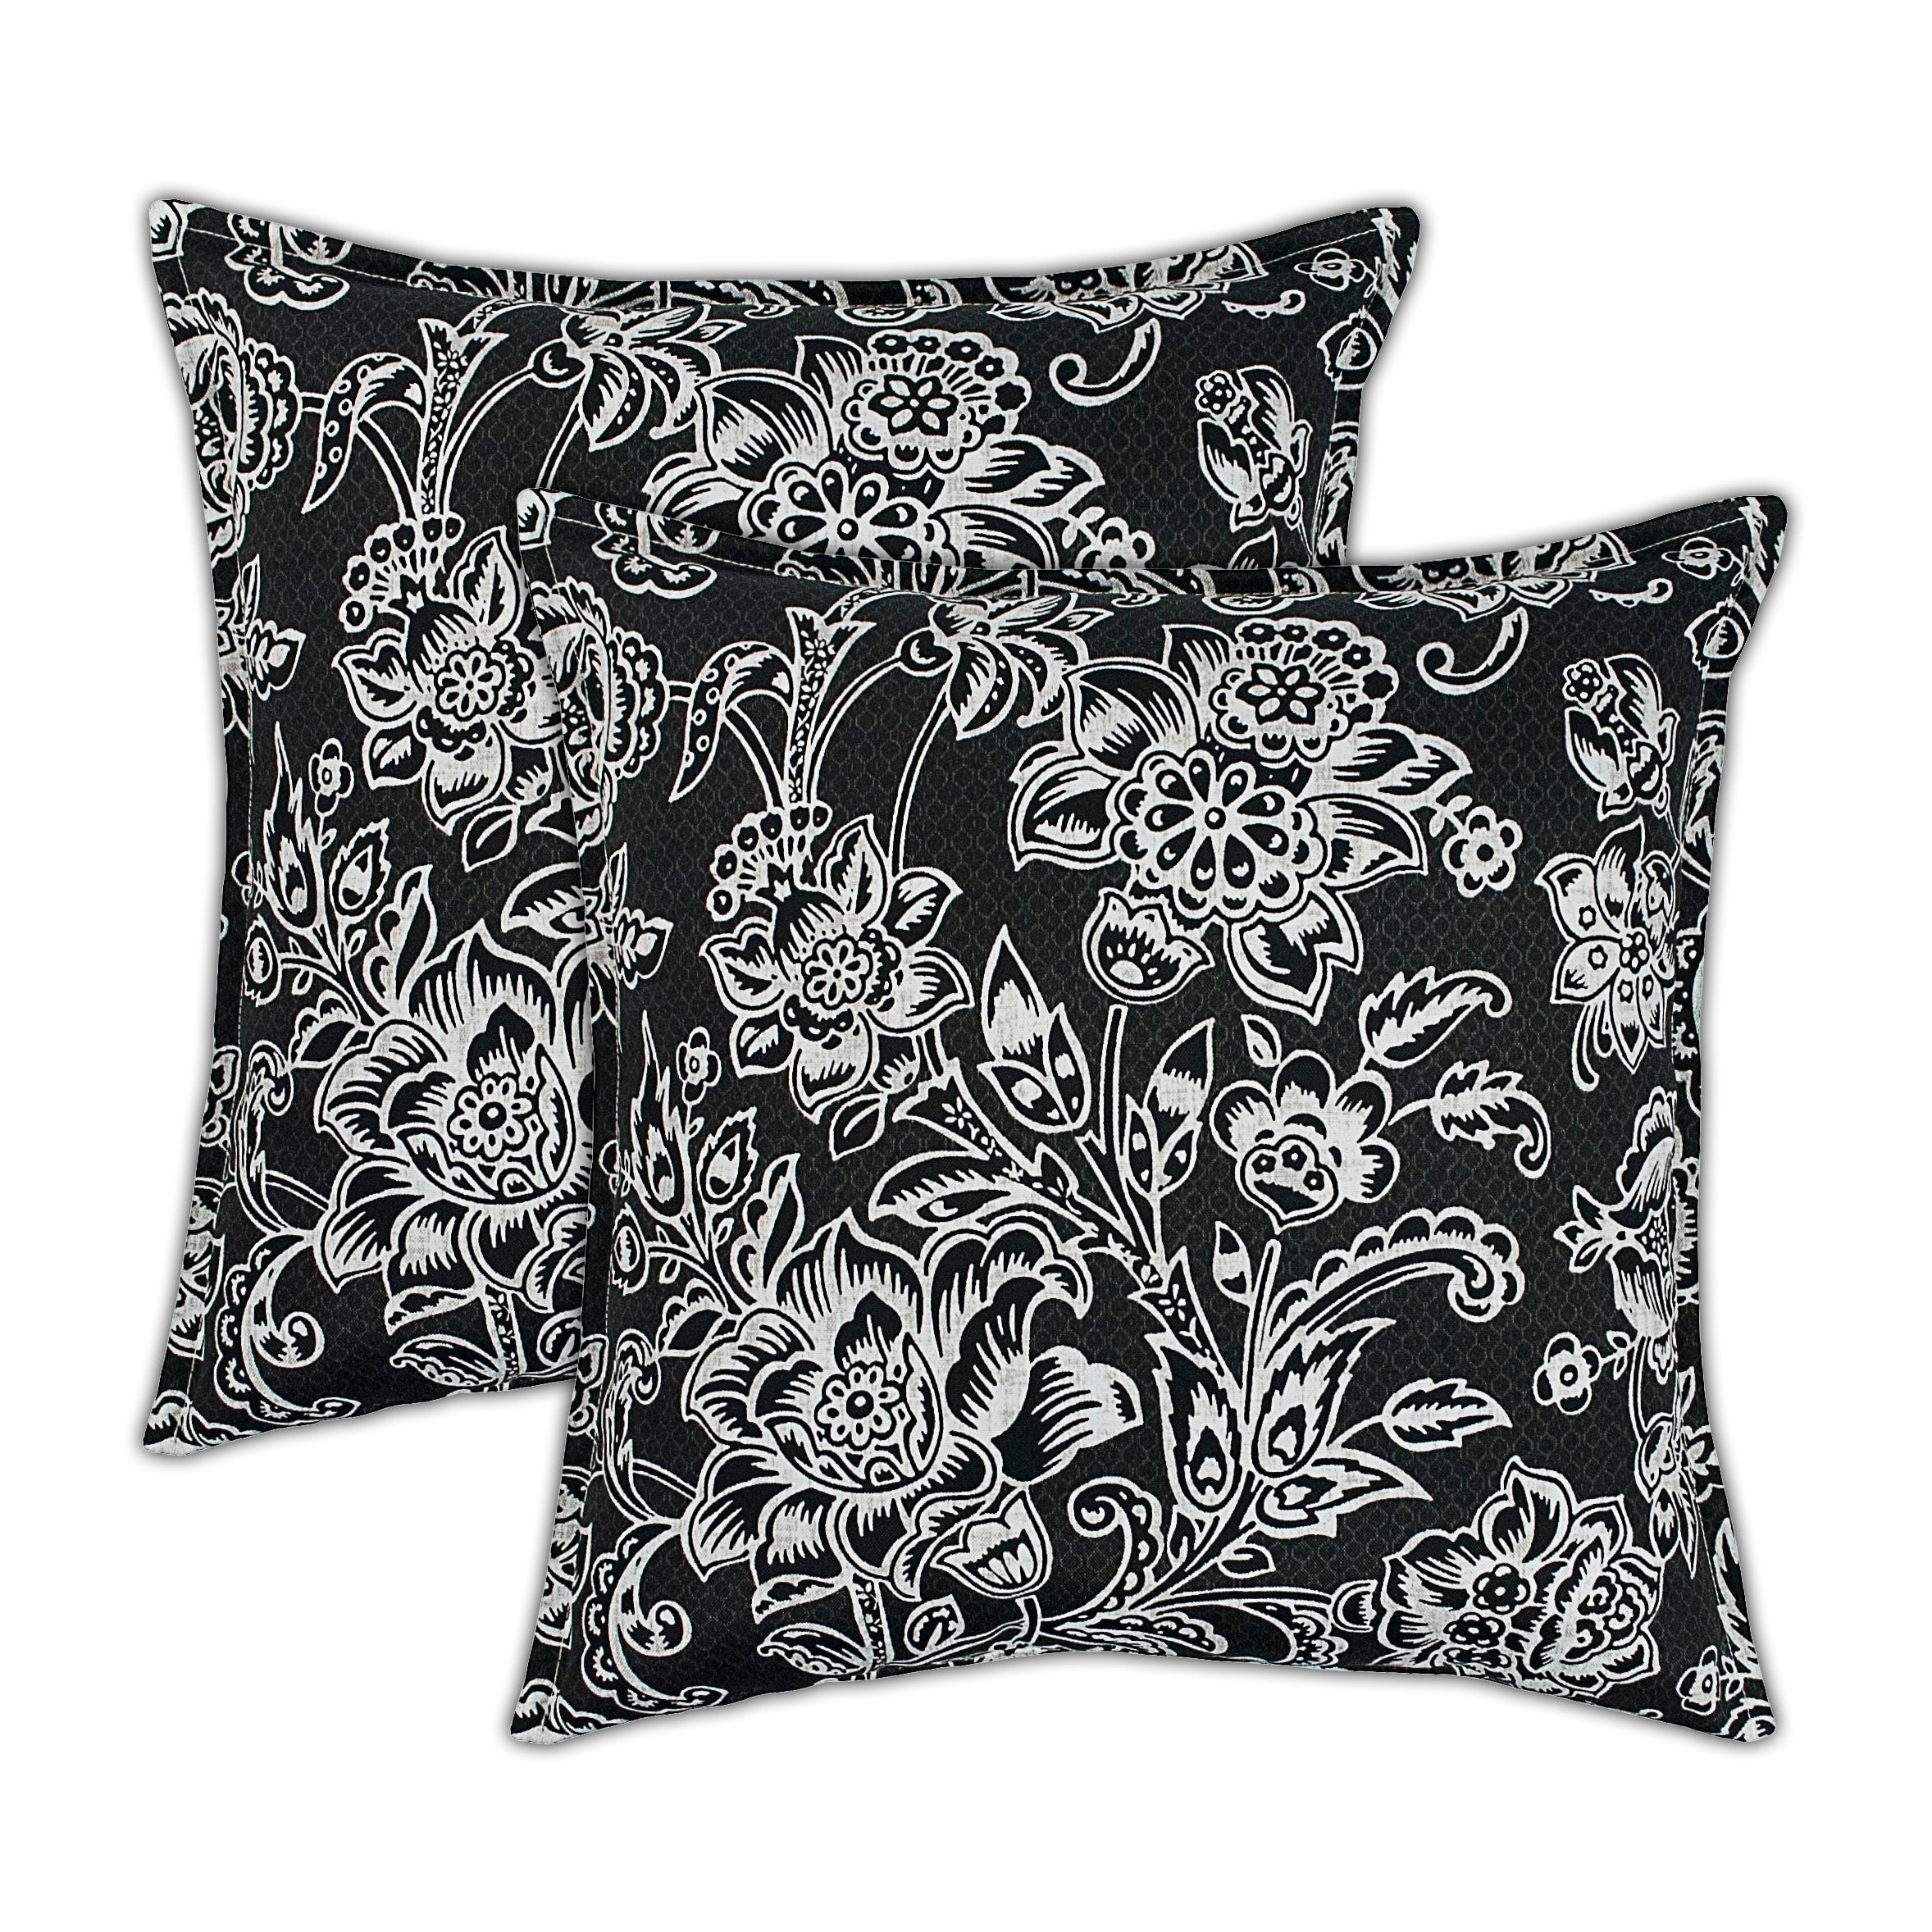 Sherry Kline Riviera 20 Inch Outdoor Pillows Set Of 2 20 X 20